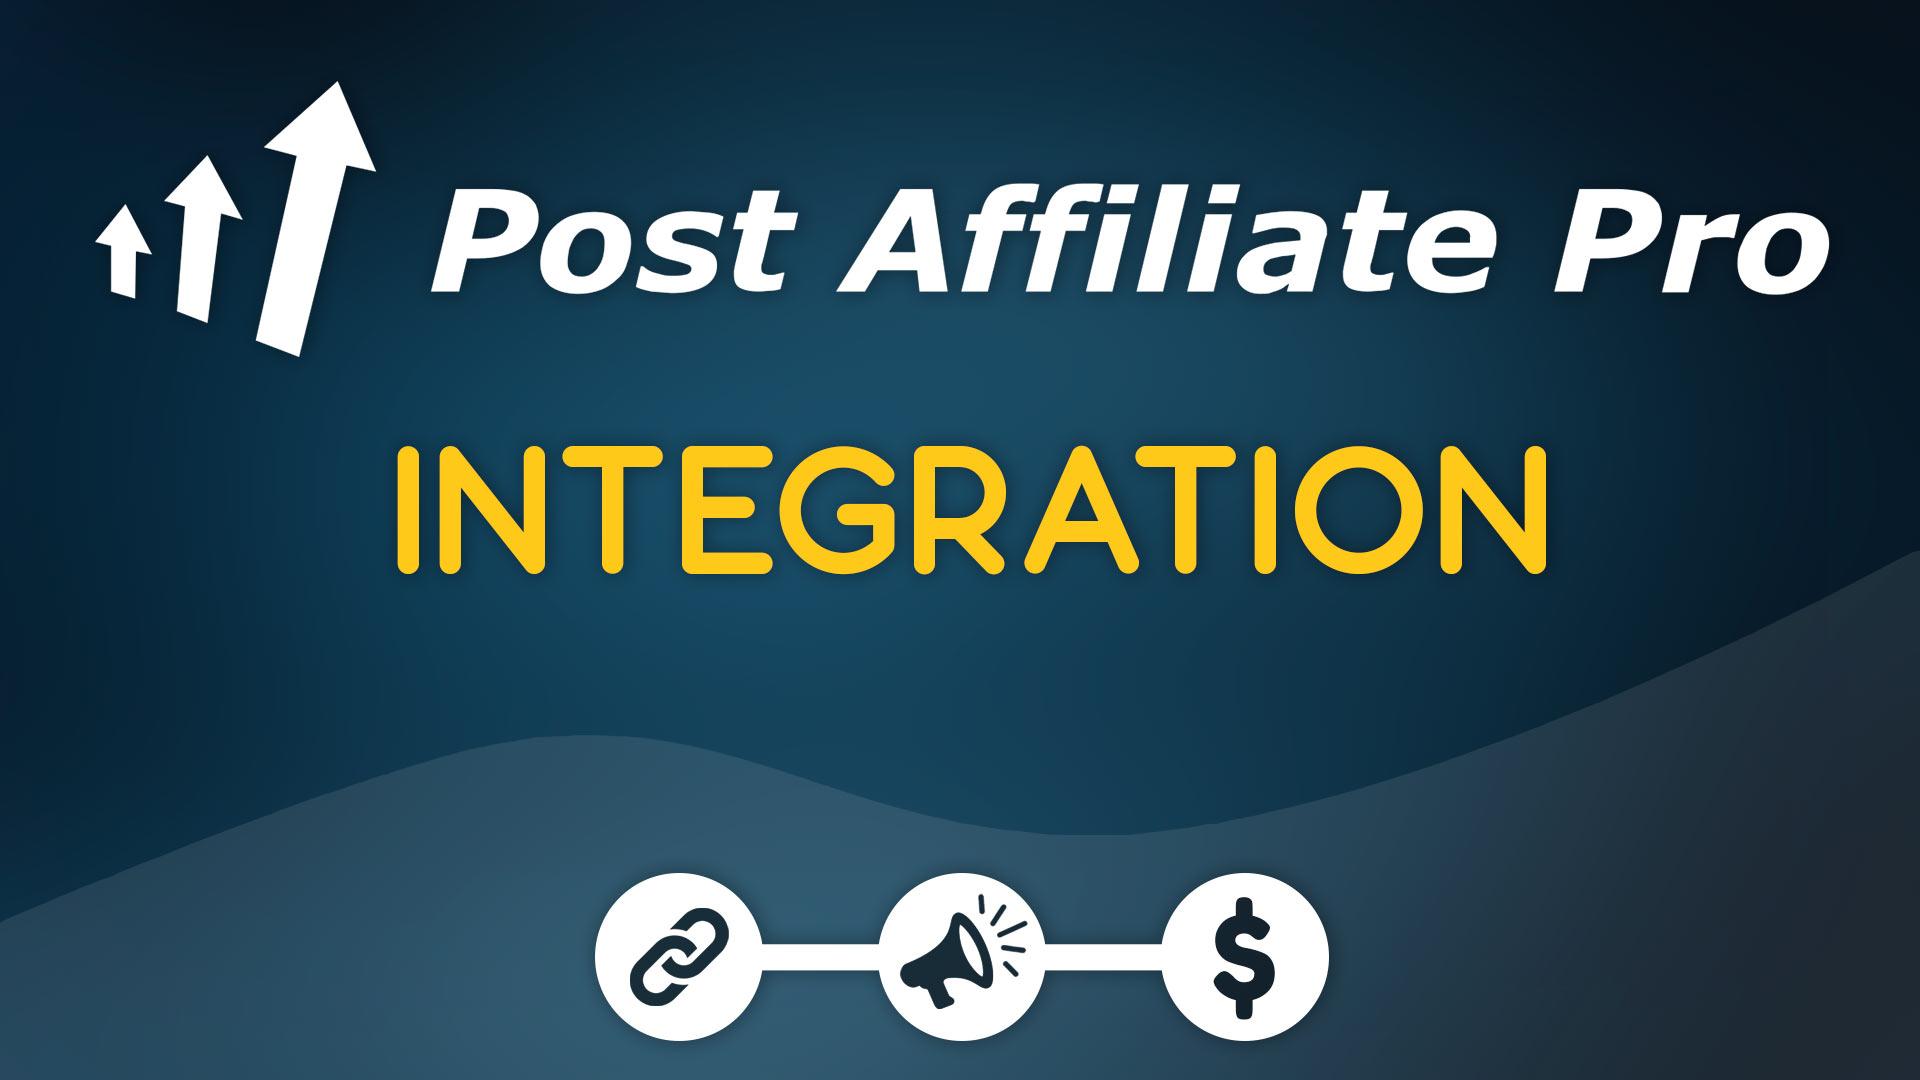 https://www.brilliantdirectories.com/post-affiliate-pro-integration